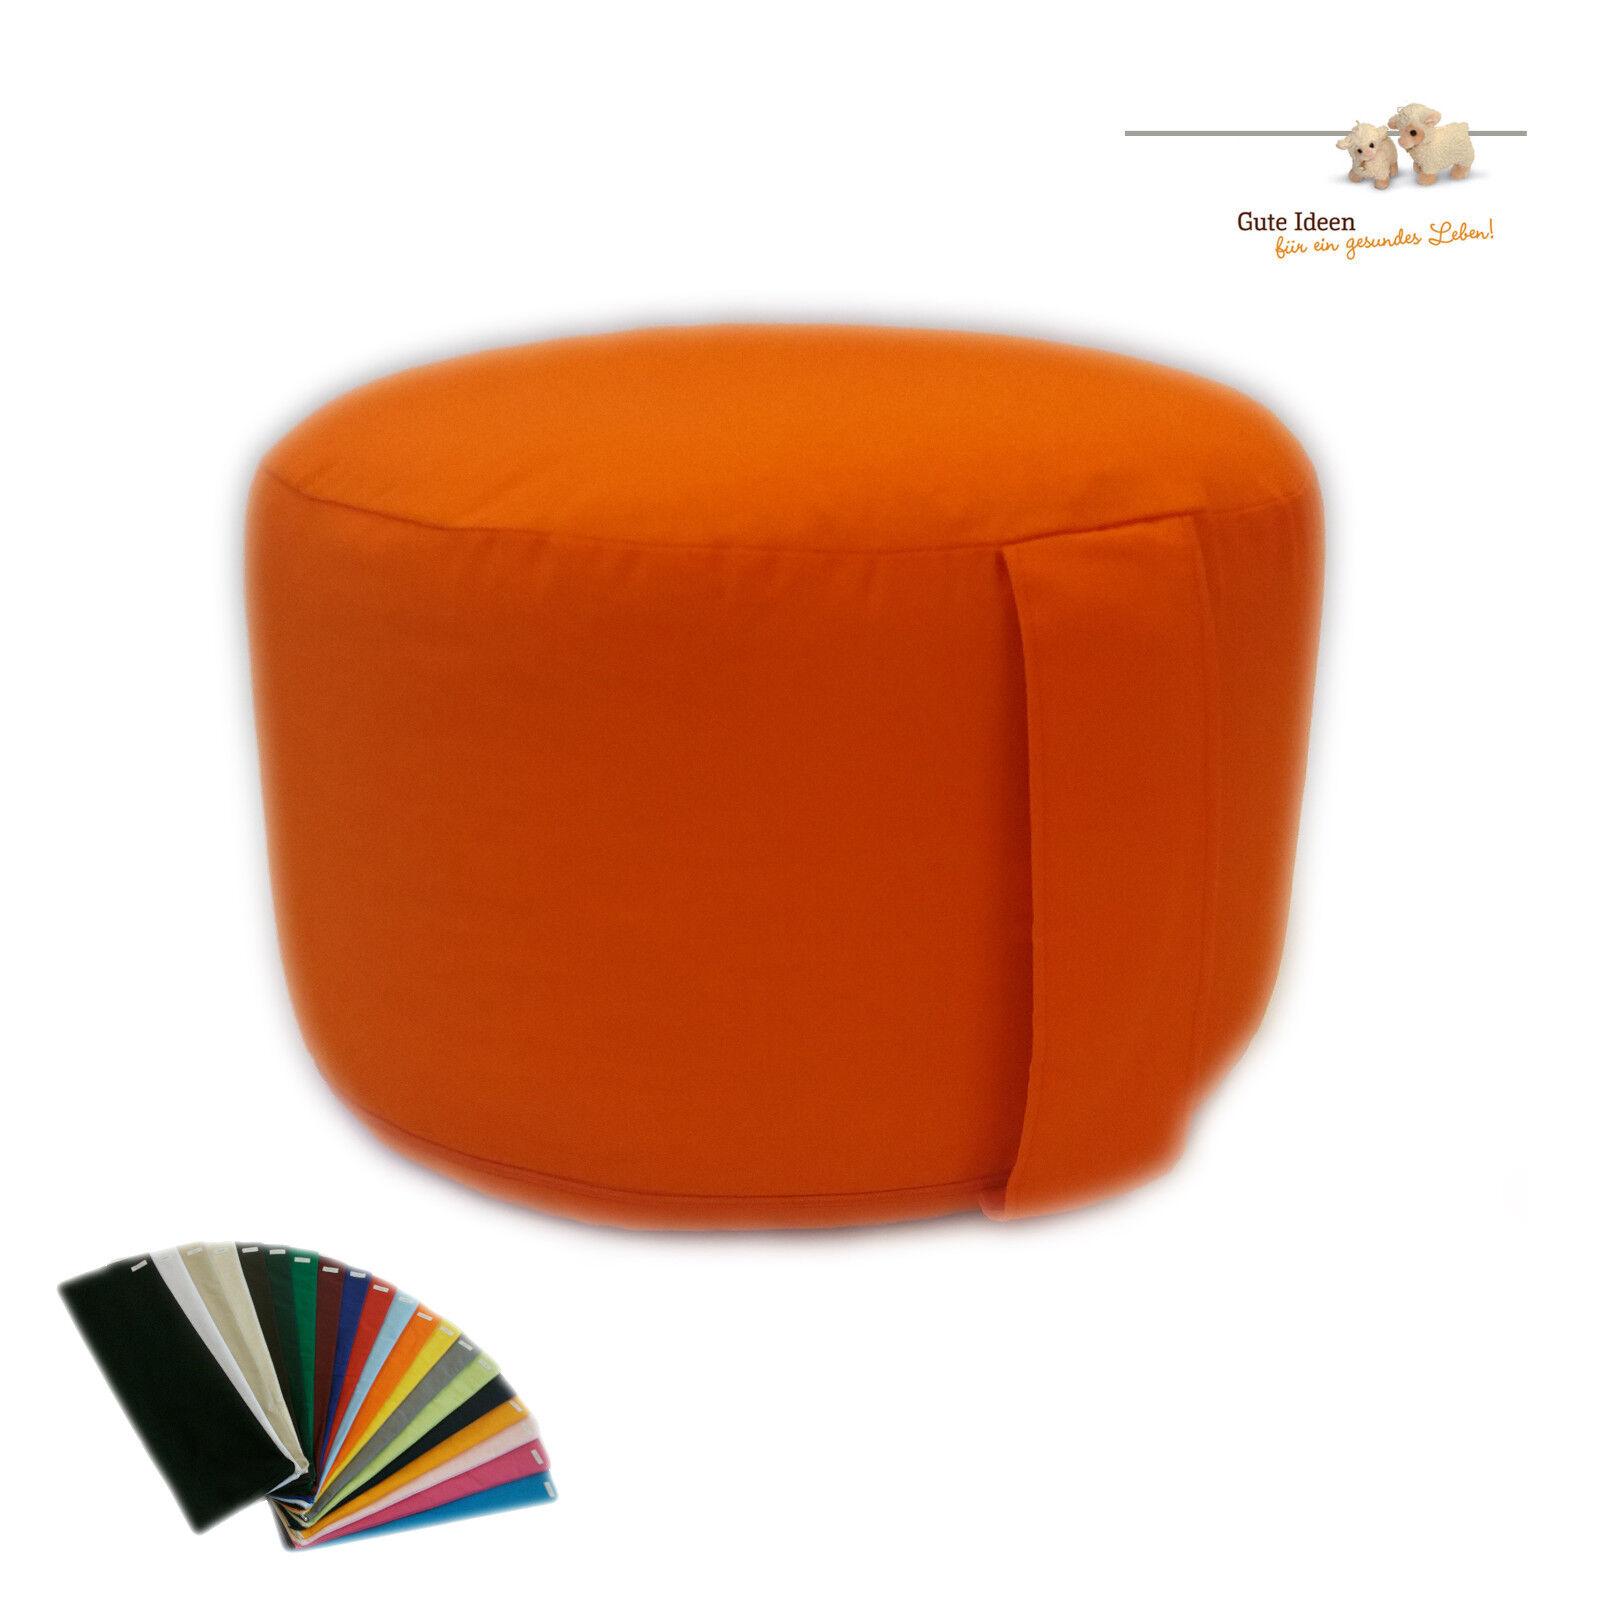 Yoga Pillow Meditation Cushion round Maxi Ø 35 Cm x 24cm H, Various colors